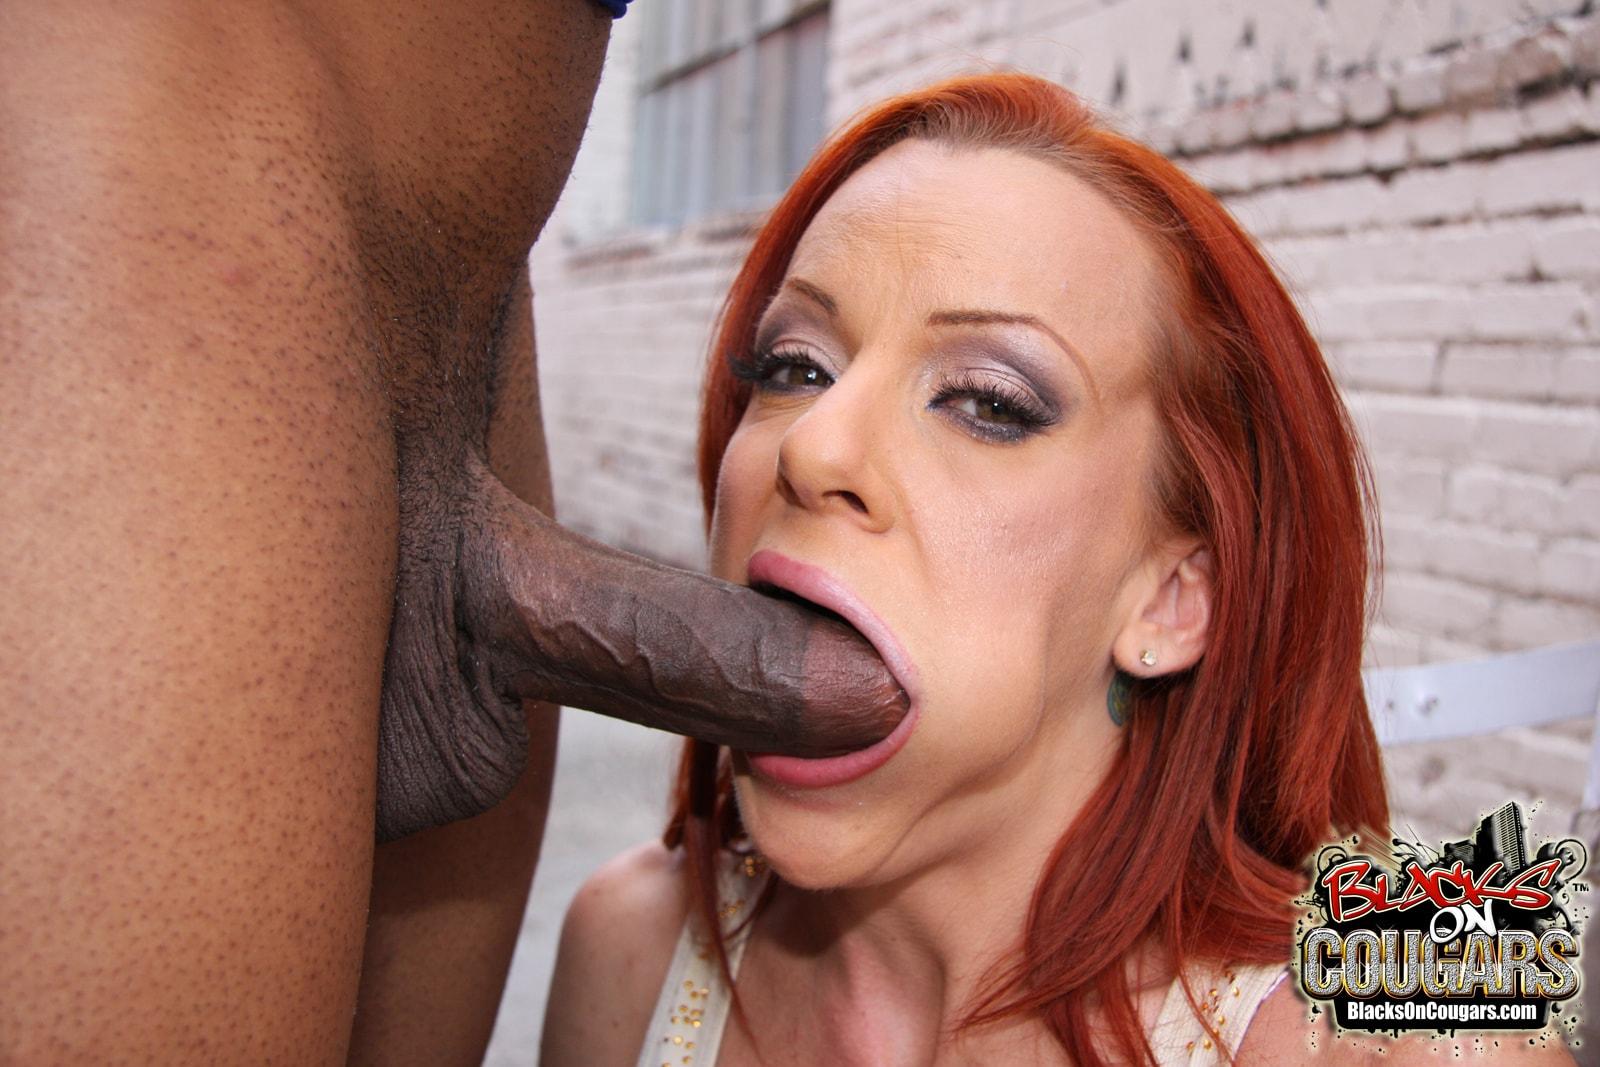 Dogfart '- Blacks On Cougars' starring Shannon Kelly (Photo 11)